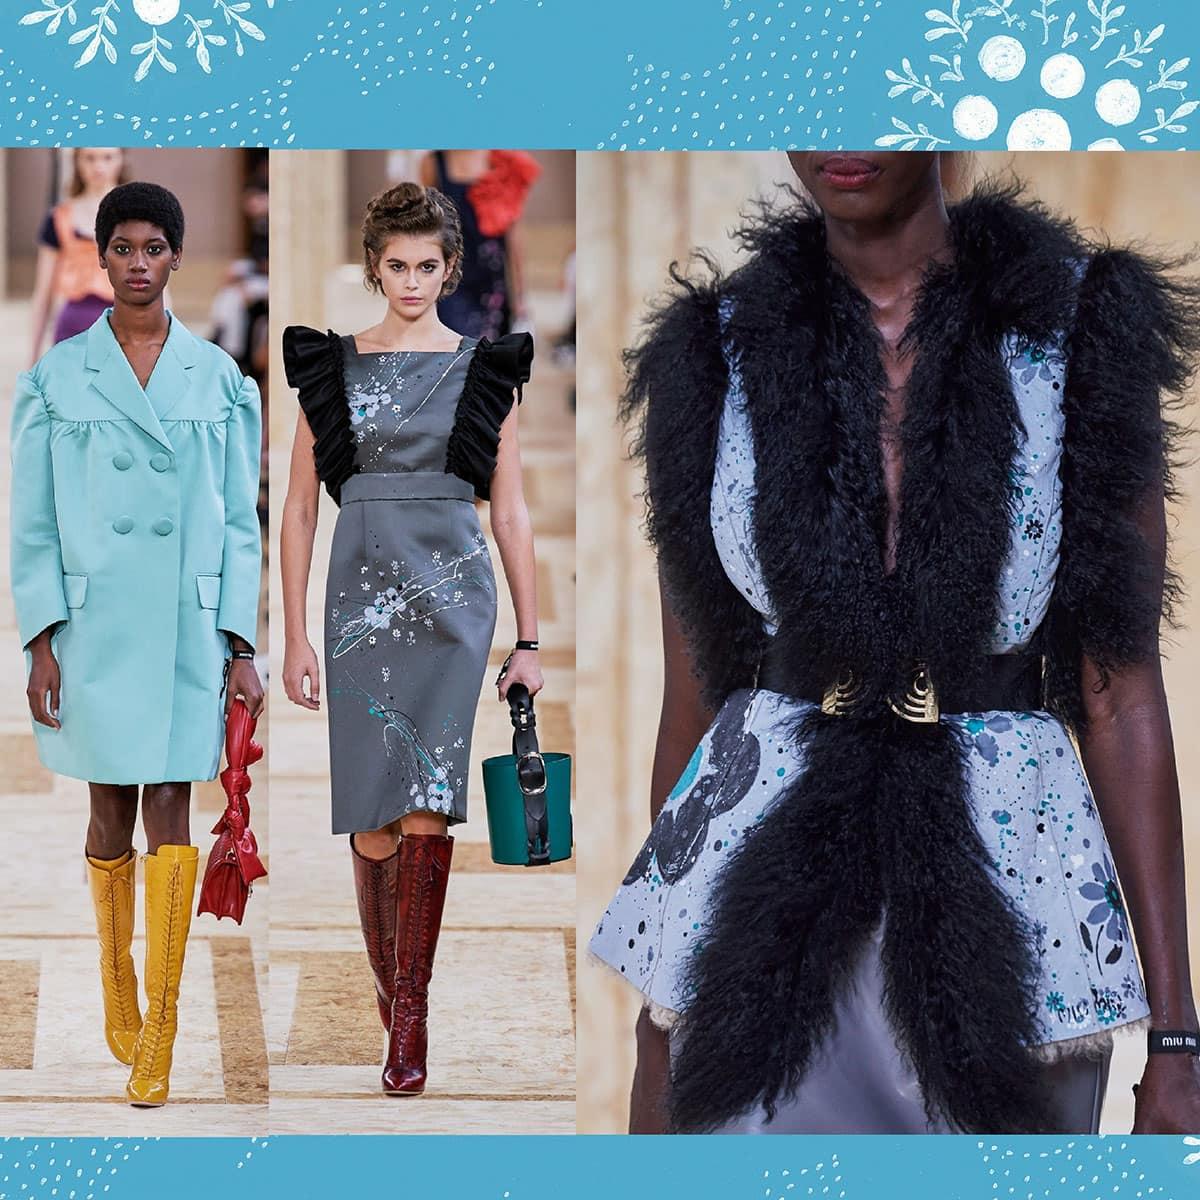 Miu Miu Spring Summer 2020 Paris Fashion Week. RUNWAY MAGAZINE ® Collections. RUNWAY NOW / RUNWAY NEW